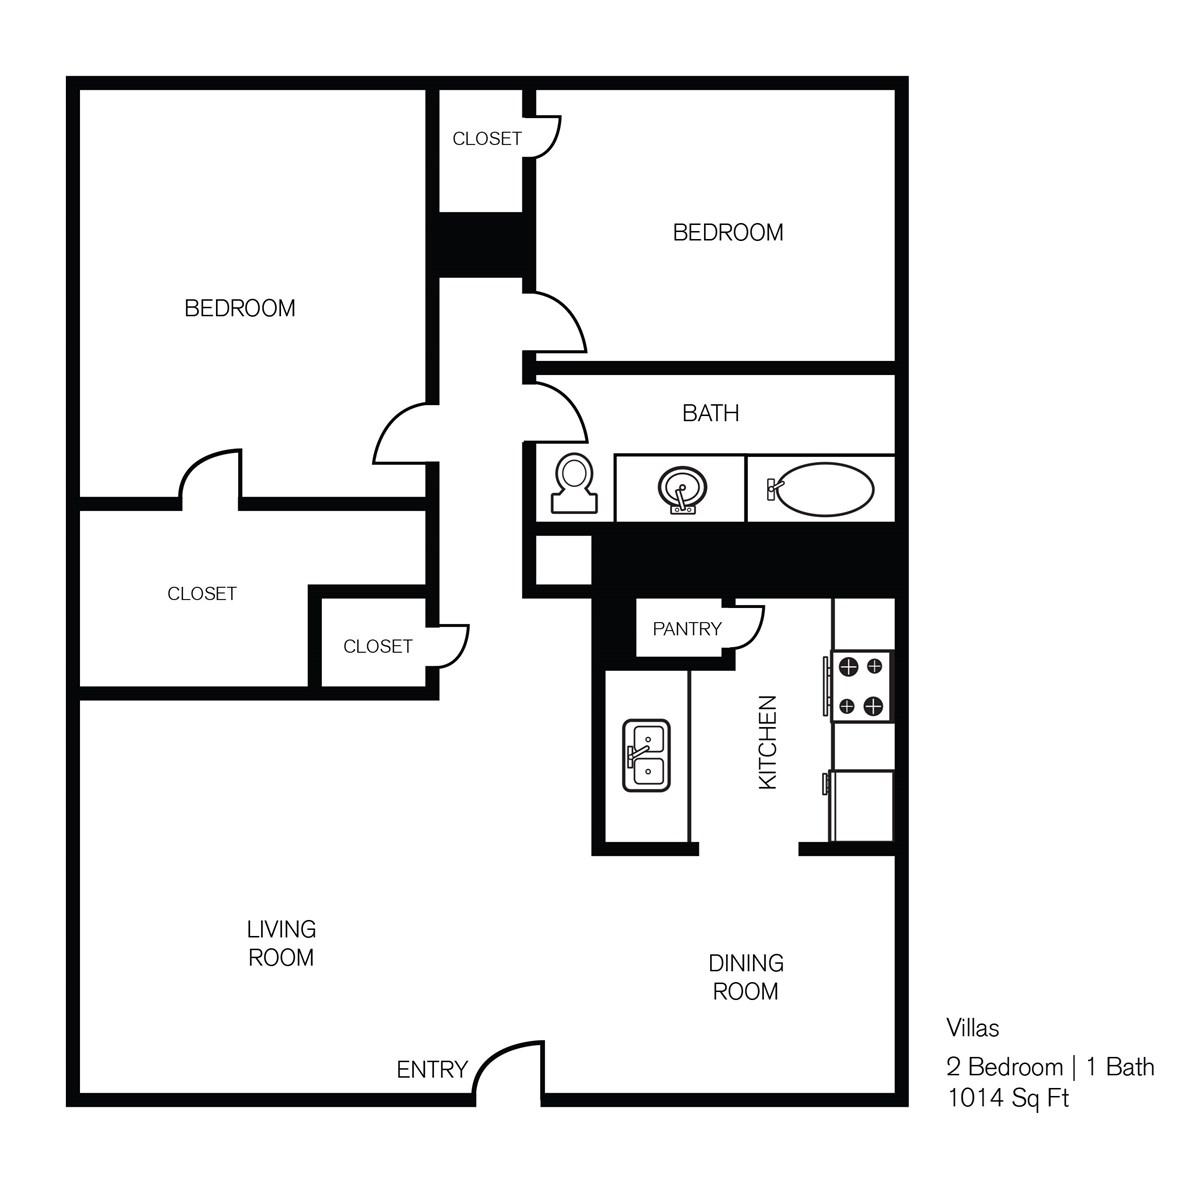 1,014 sq. ft. Colonial 2 floor plan